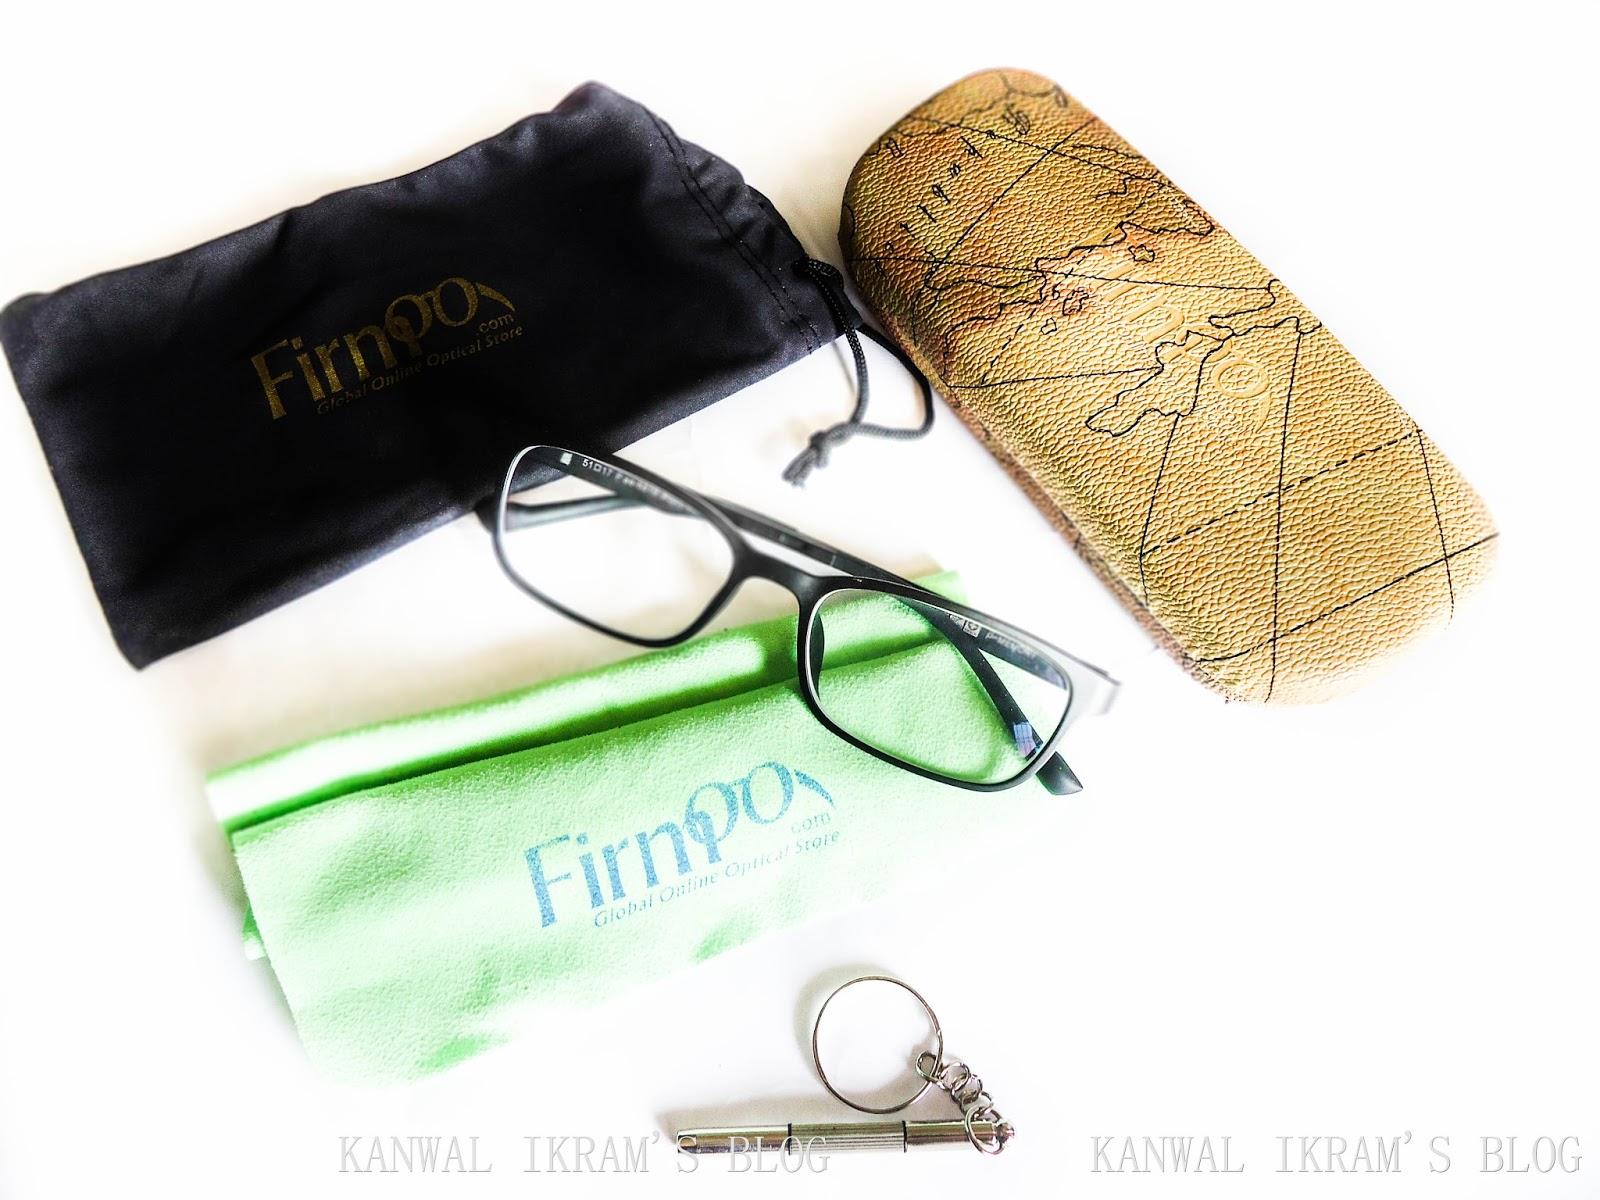 5bb9aaf309 Kanwal Ikram s Blog  Firmoo Prescription Eyewear  Review